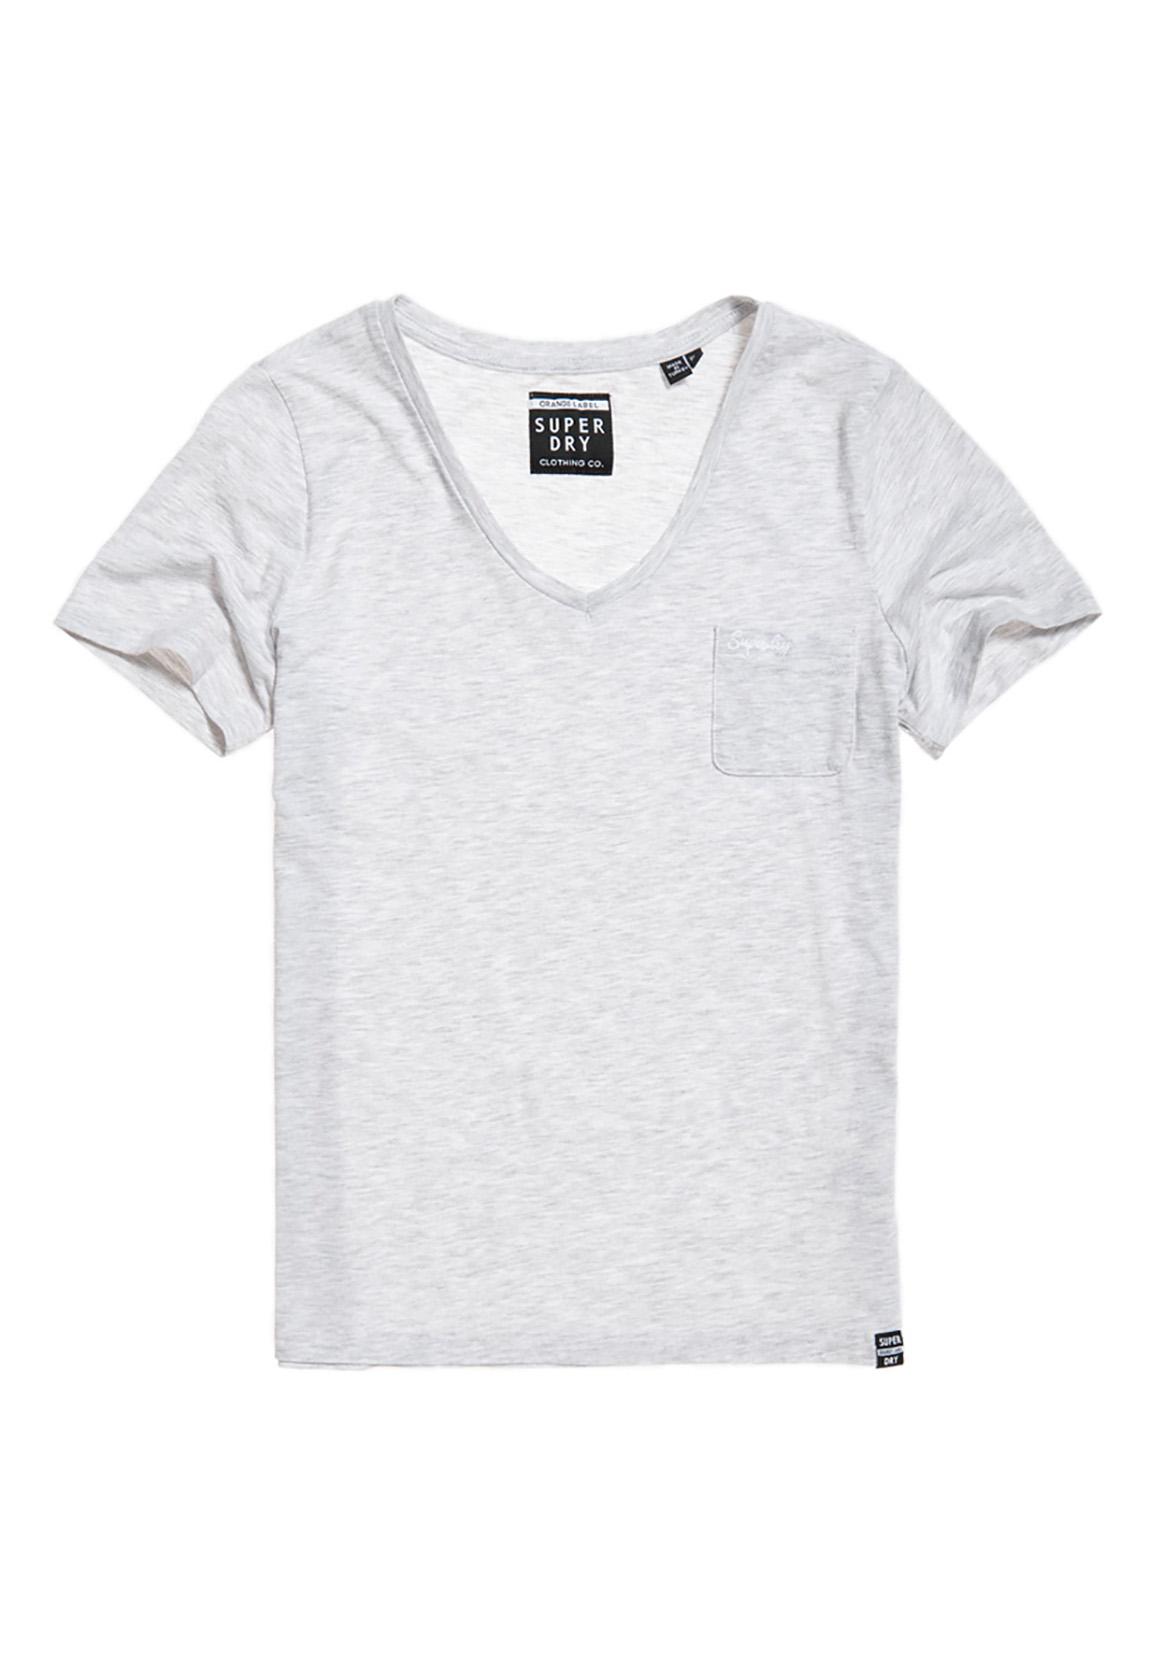 Superdry Orange Label Essential Damen T-Shirt